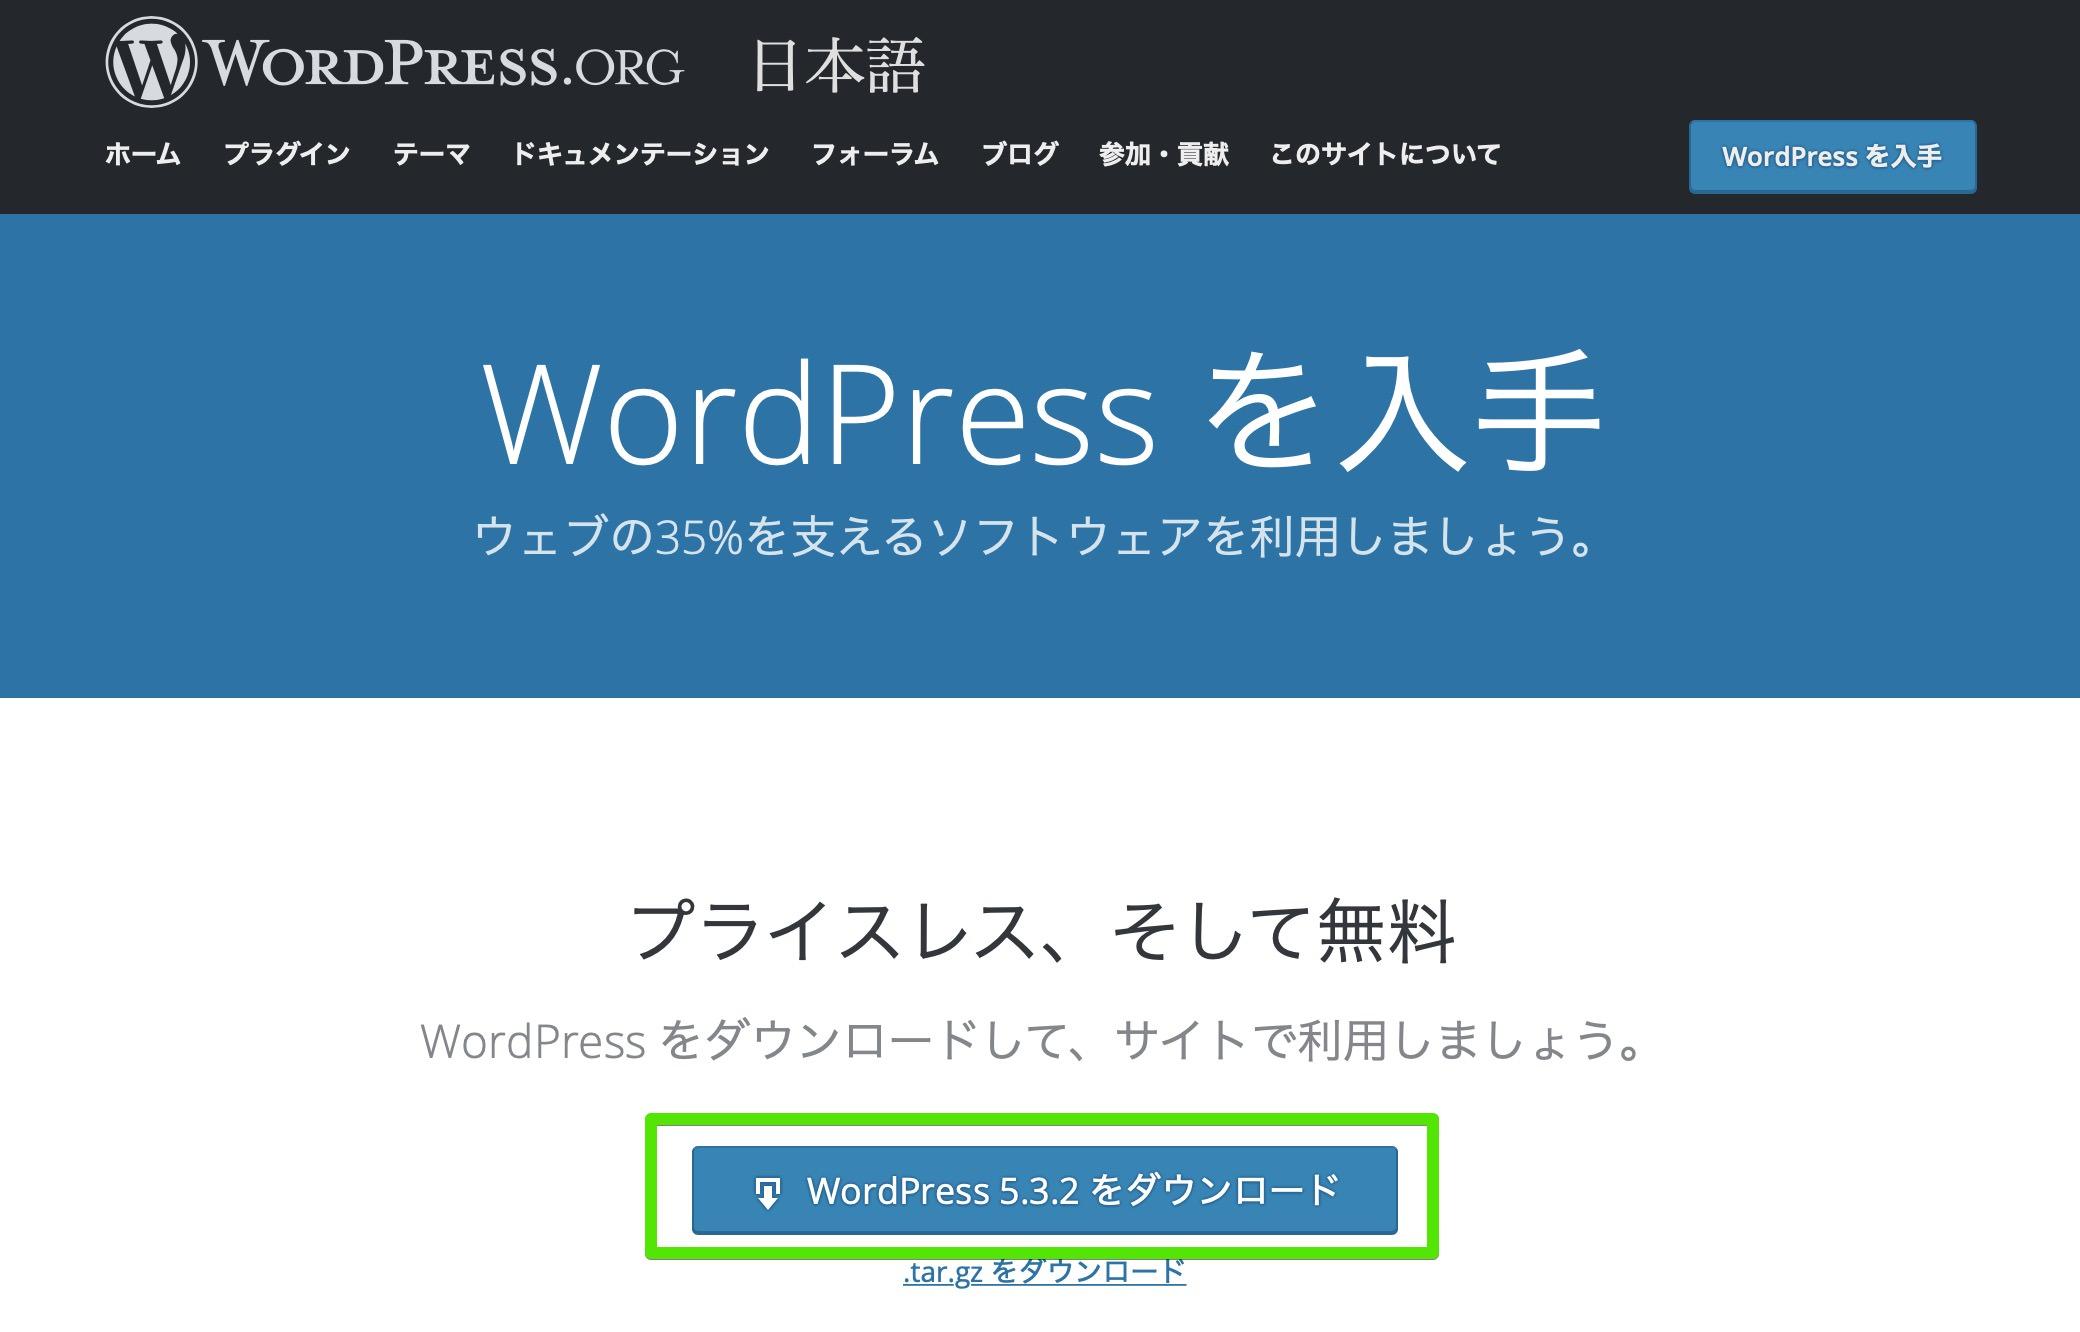 WordPress ダウンロード 公式サイト